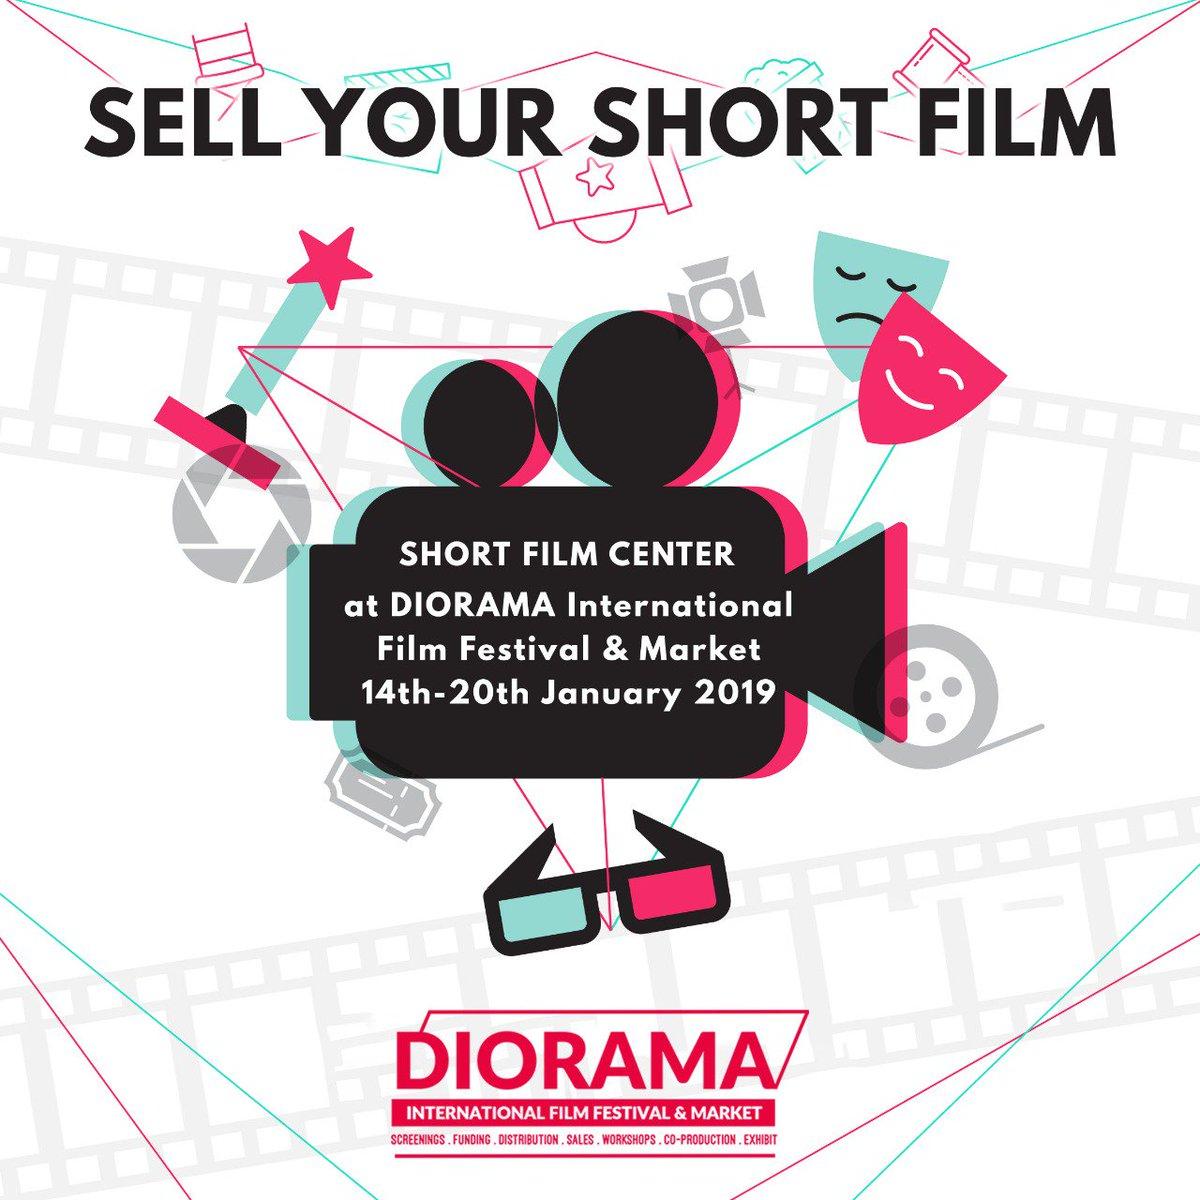 Diorama International Film Festival & Market on Twitter: